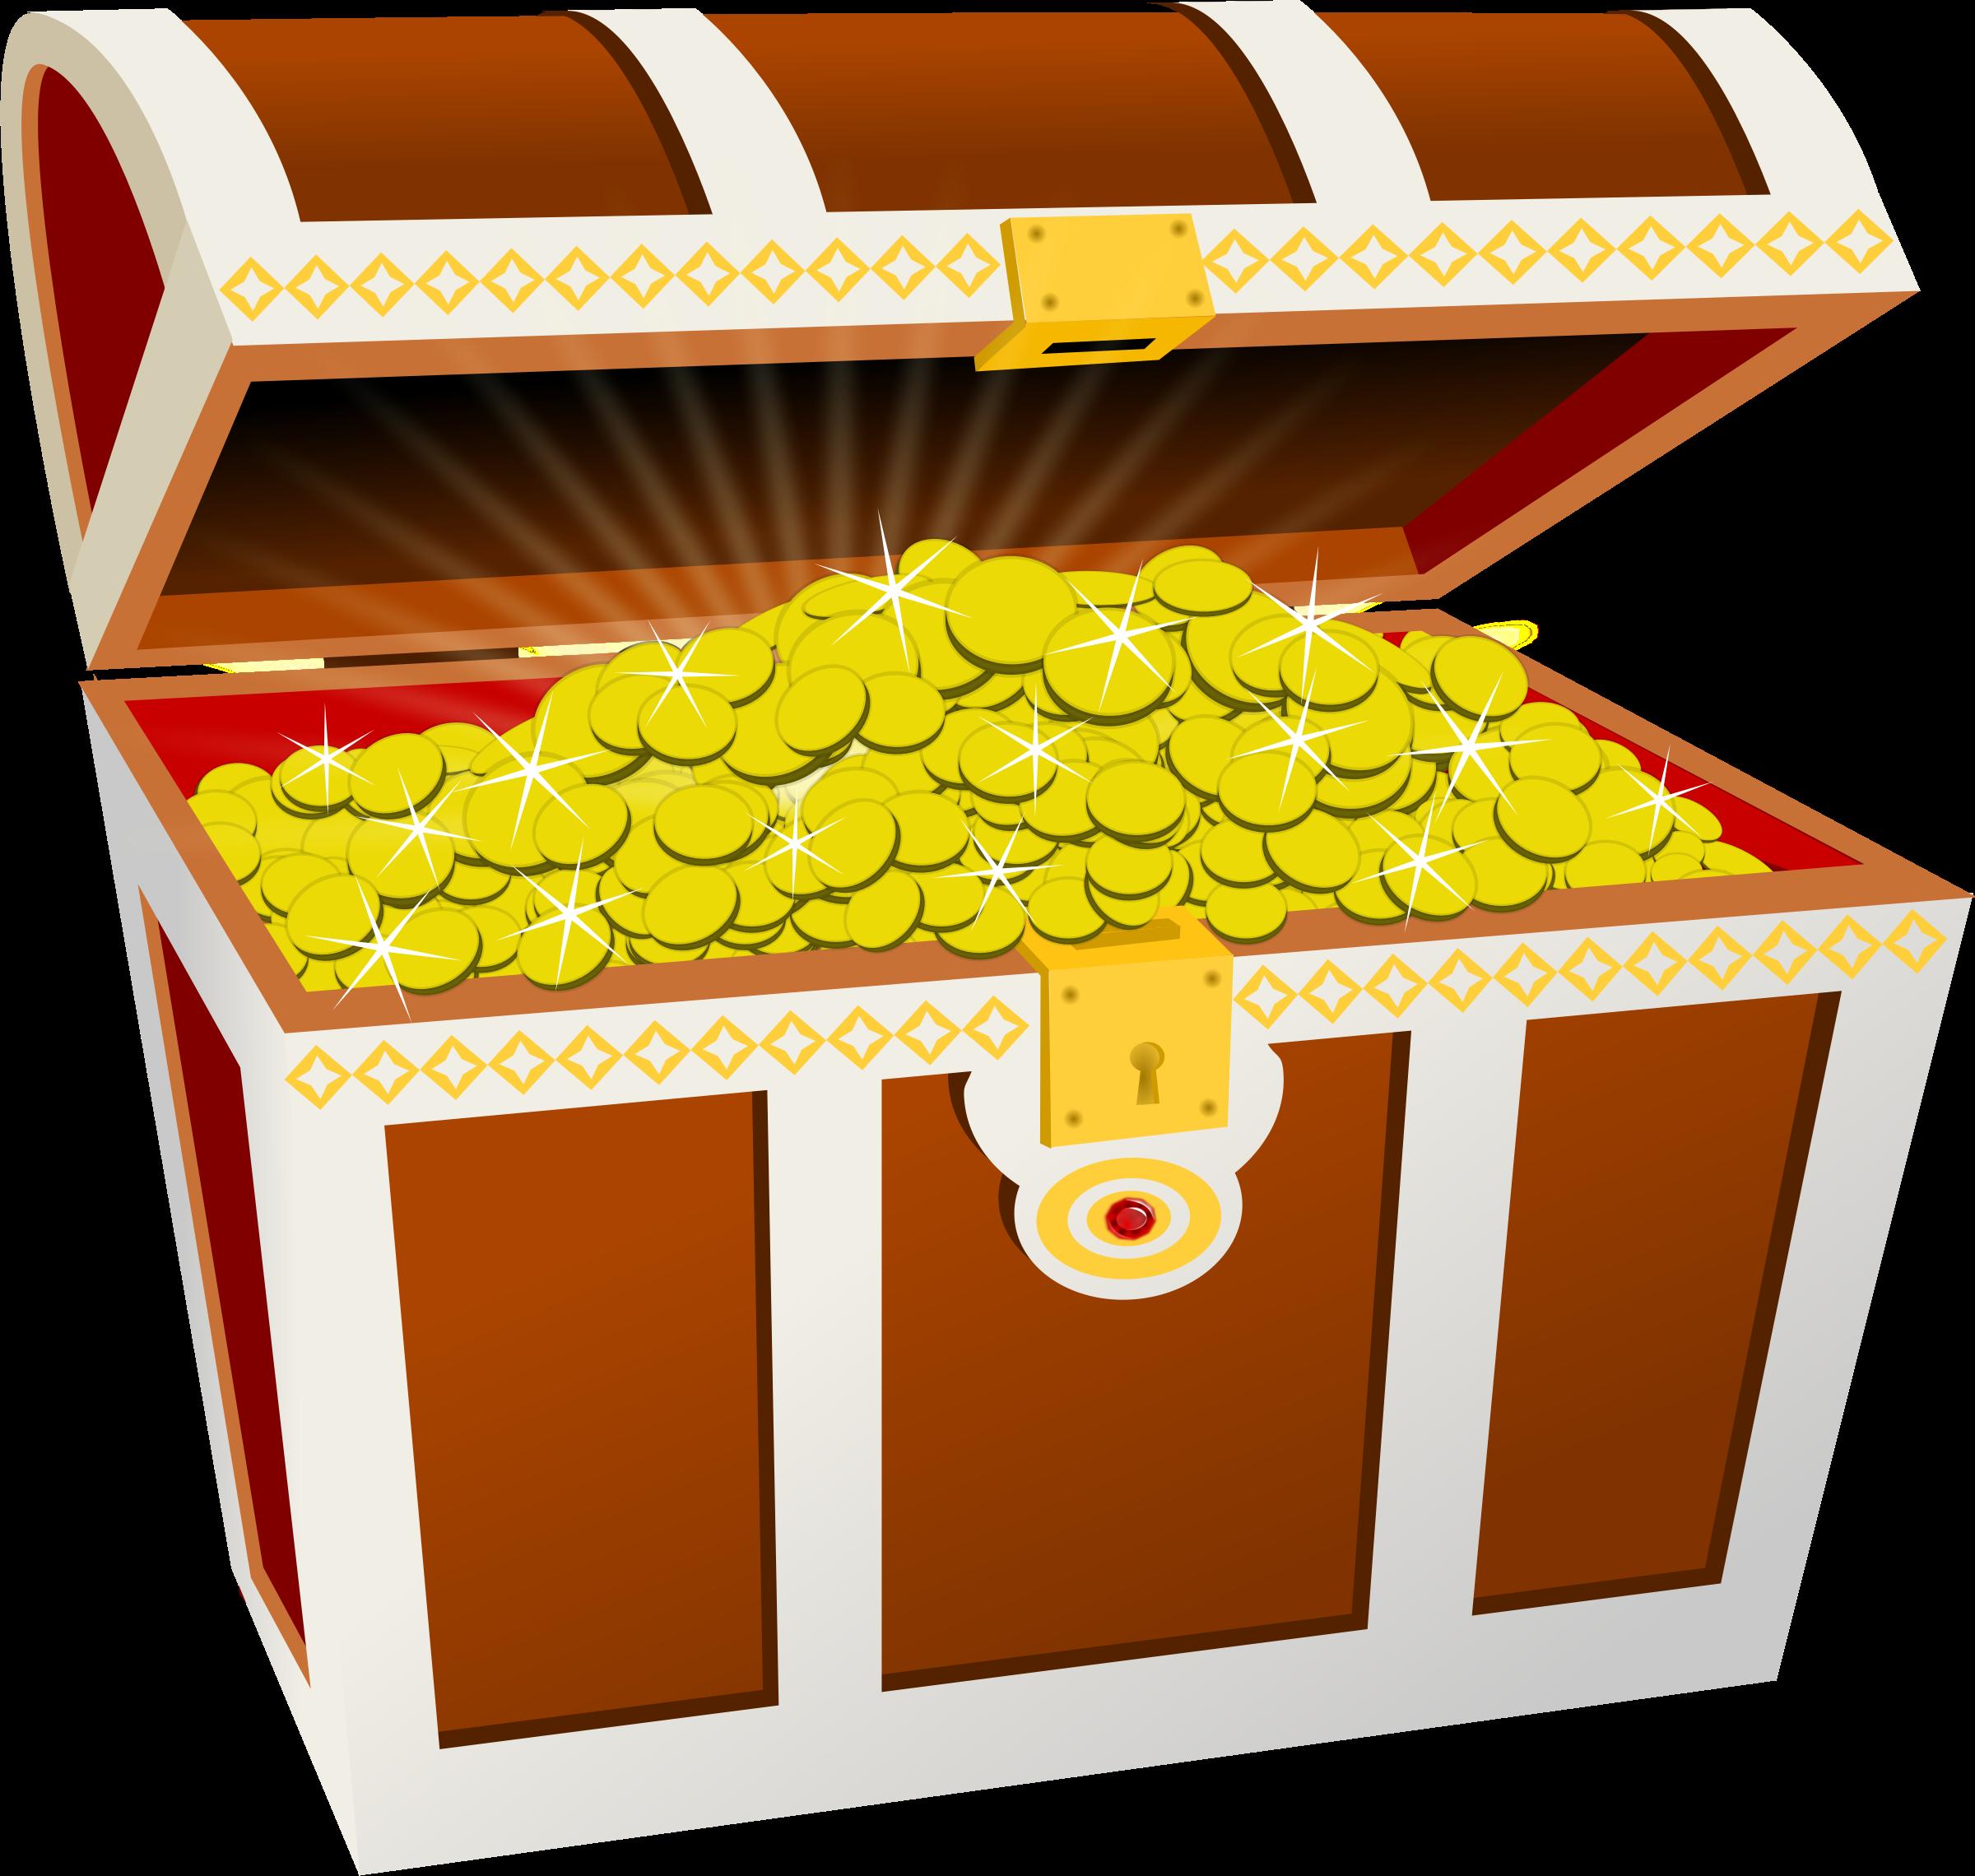 Chest big image png. Treasure clipart treasure coin